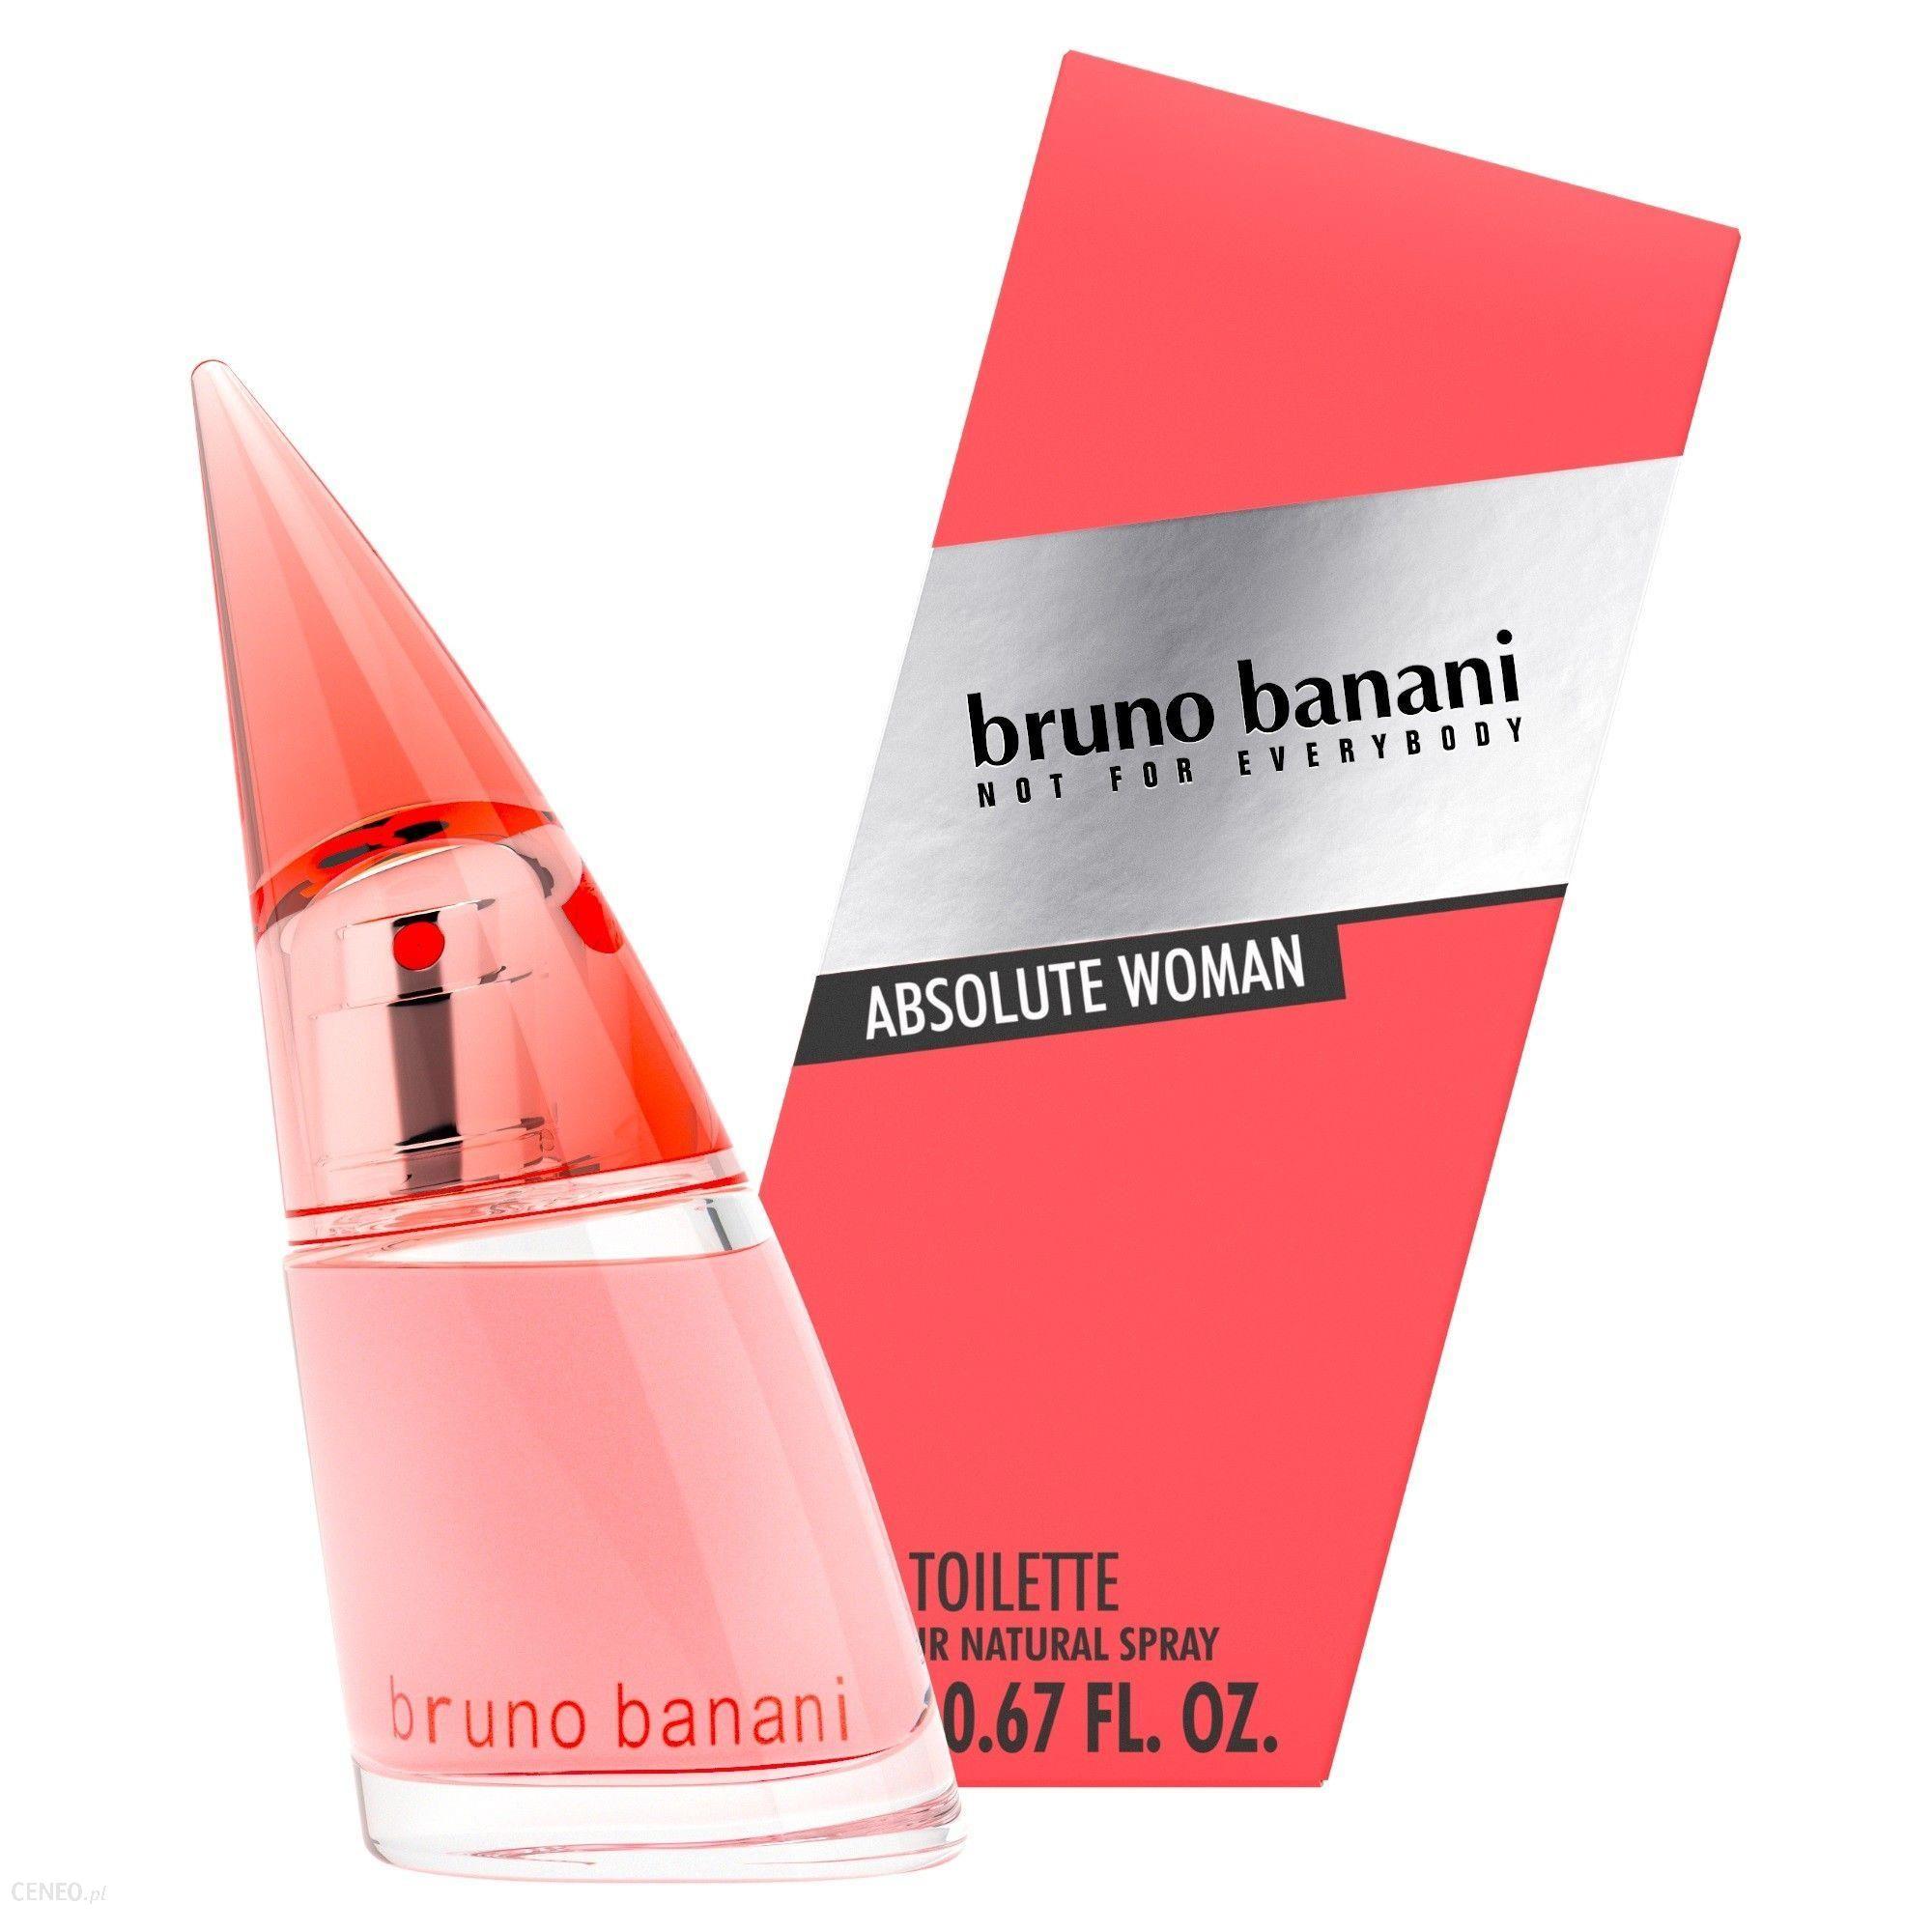 Bruno Banani Absolute Woman Woda Toaletowa 20ml